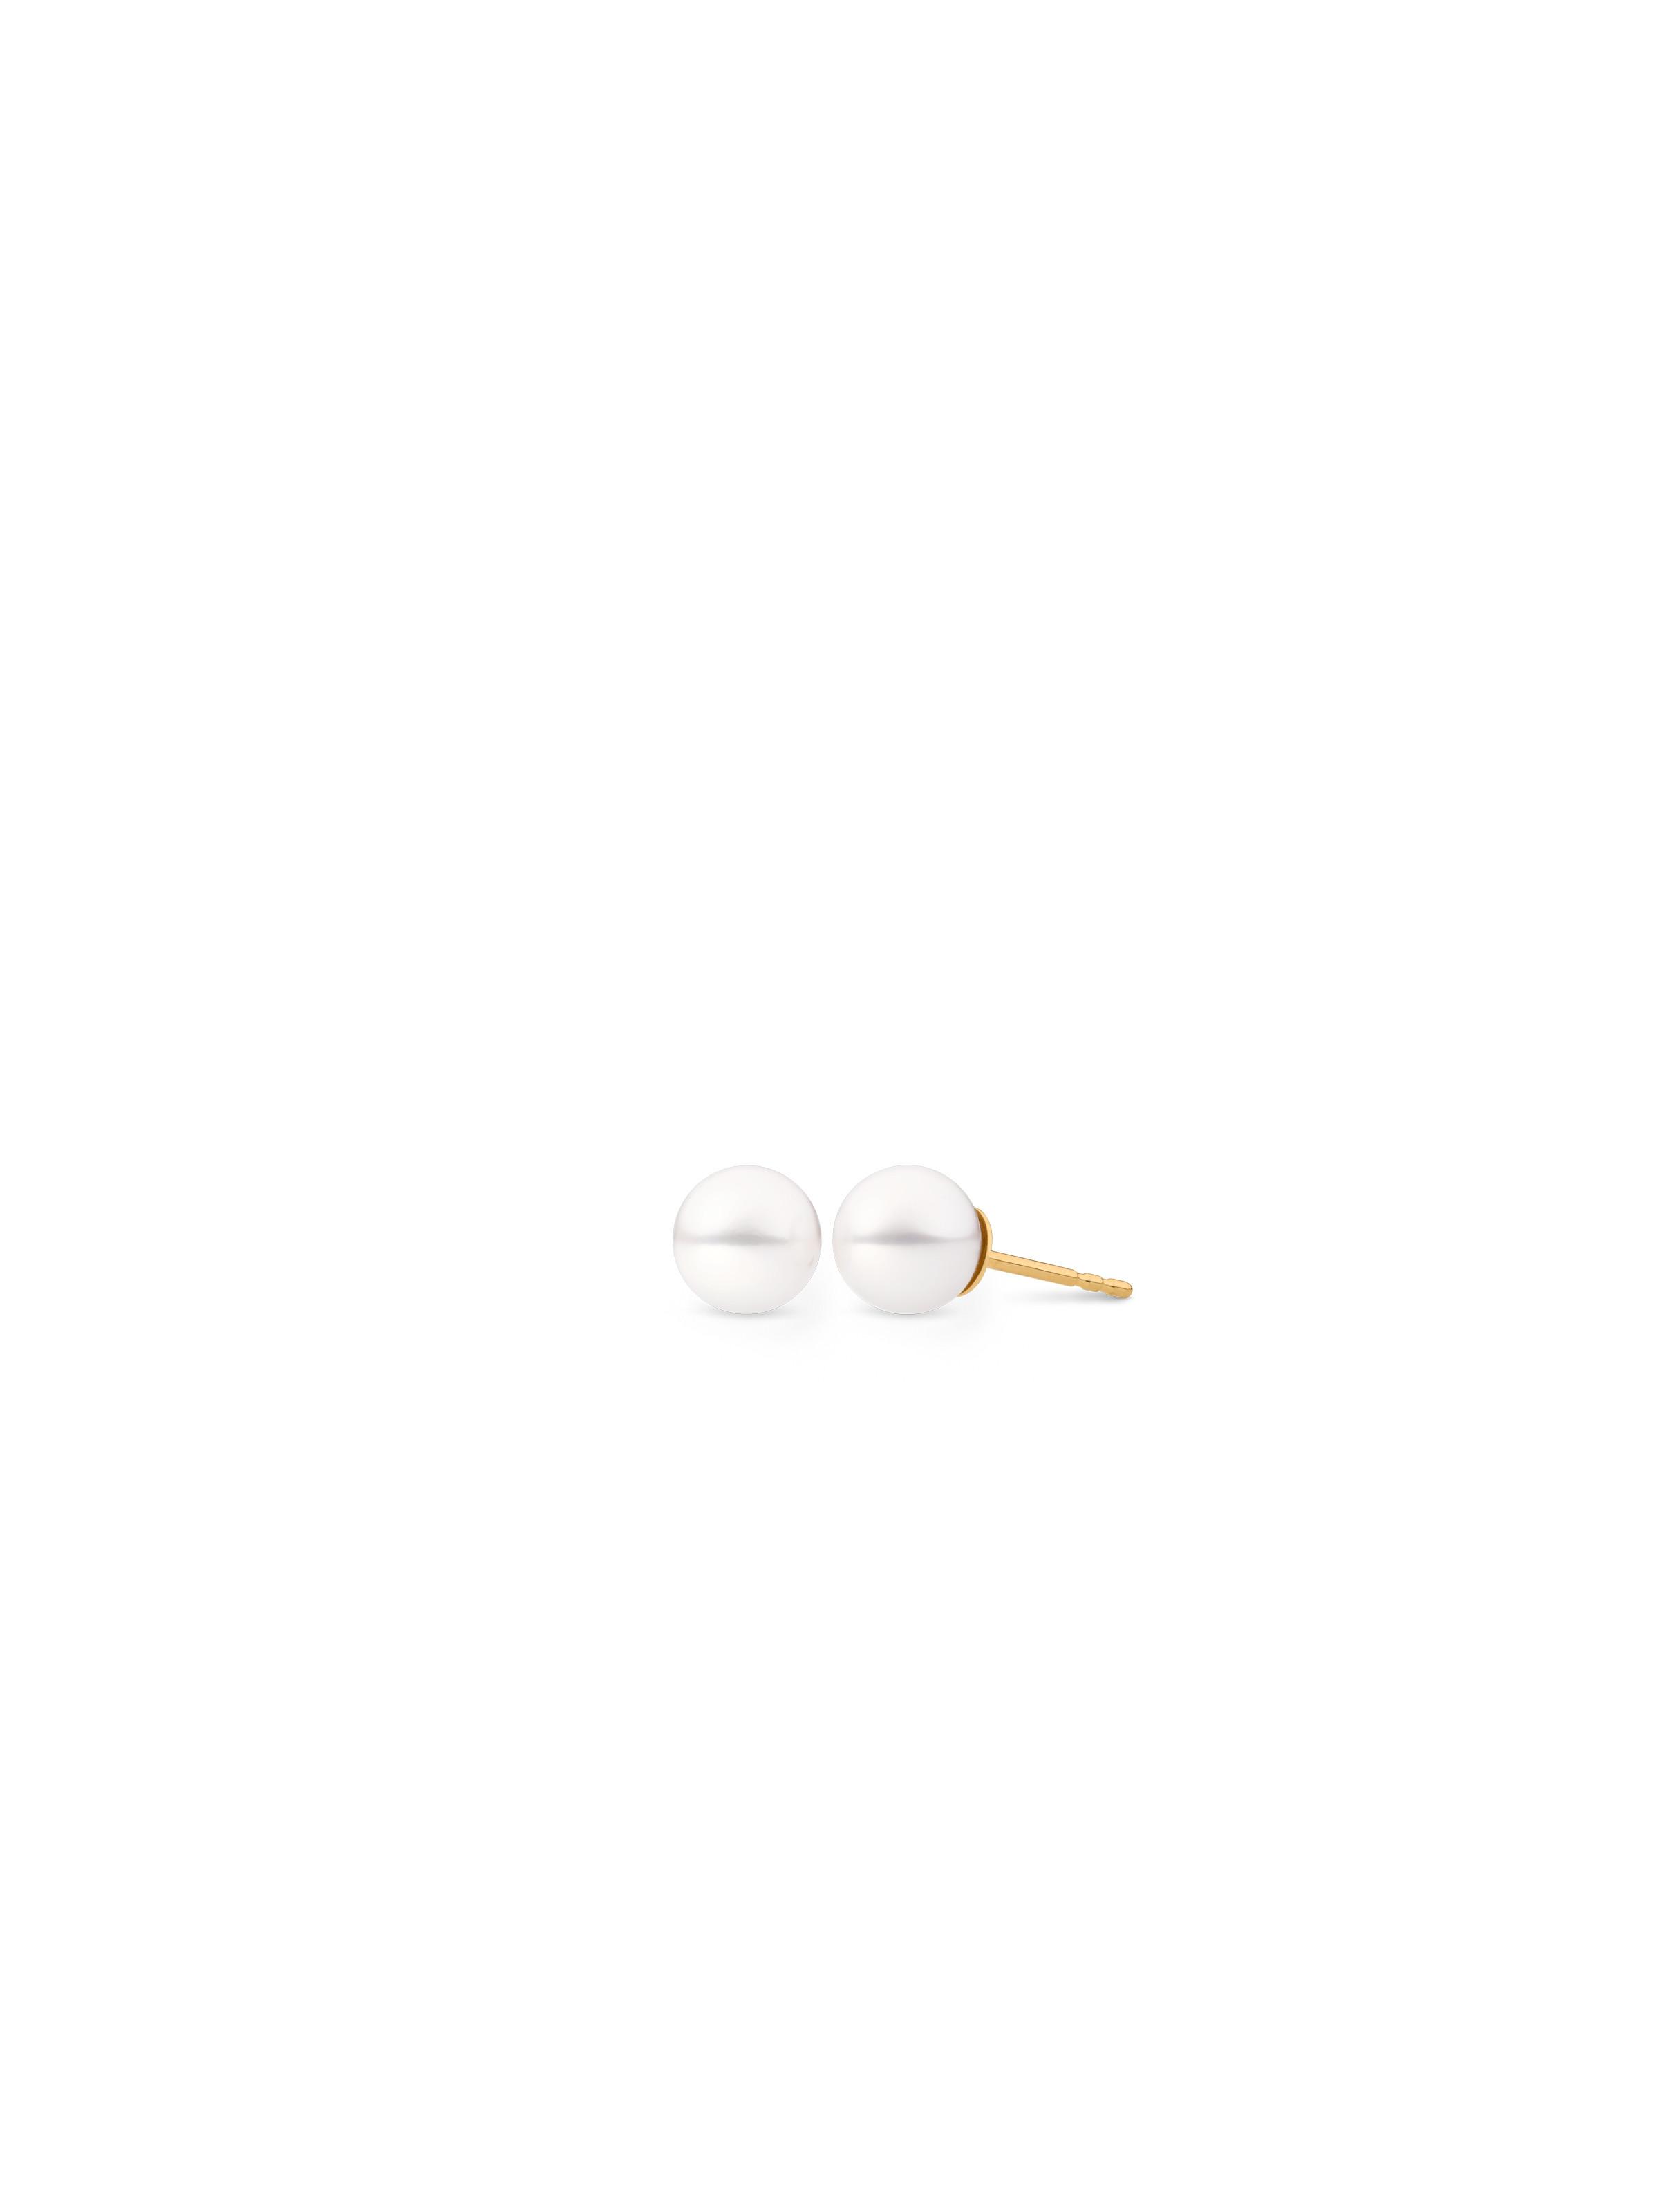 Basics ear studs